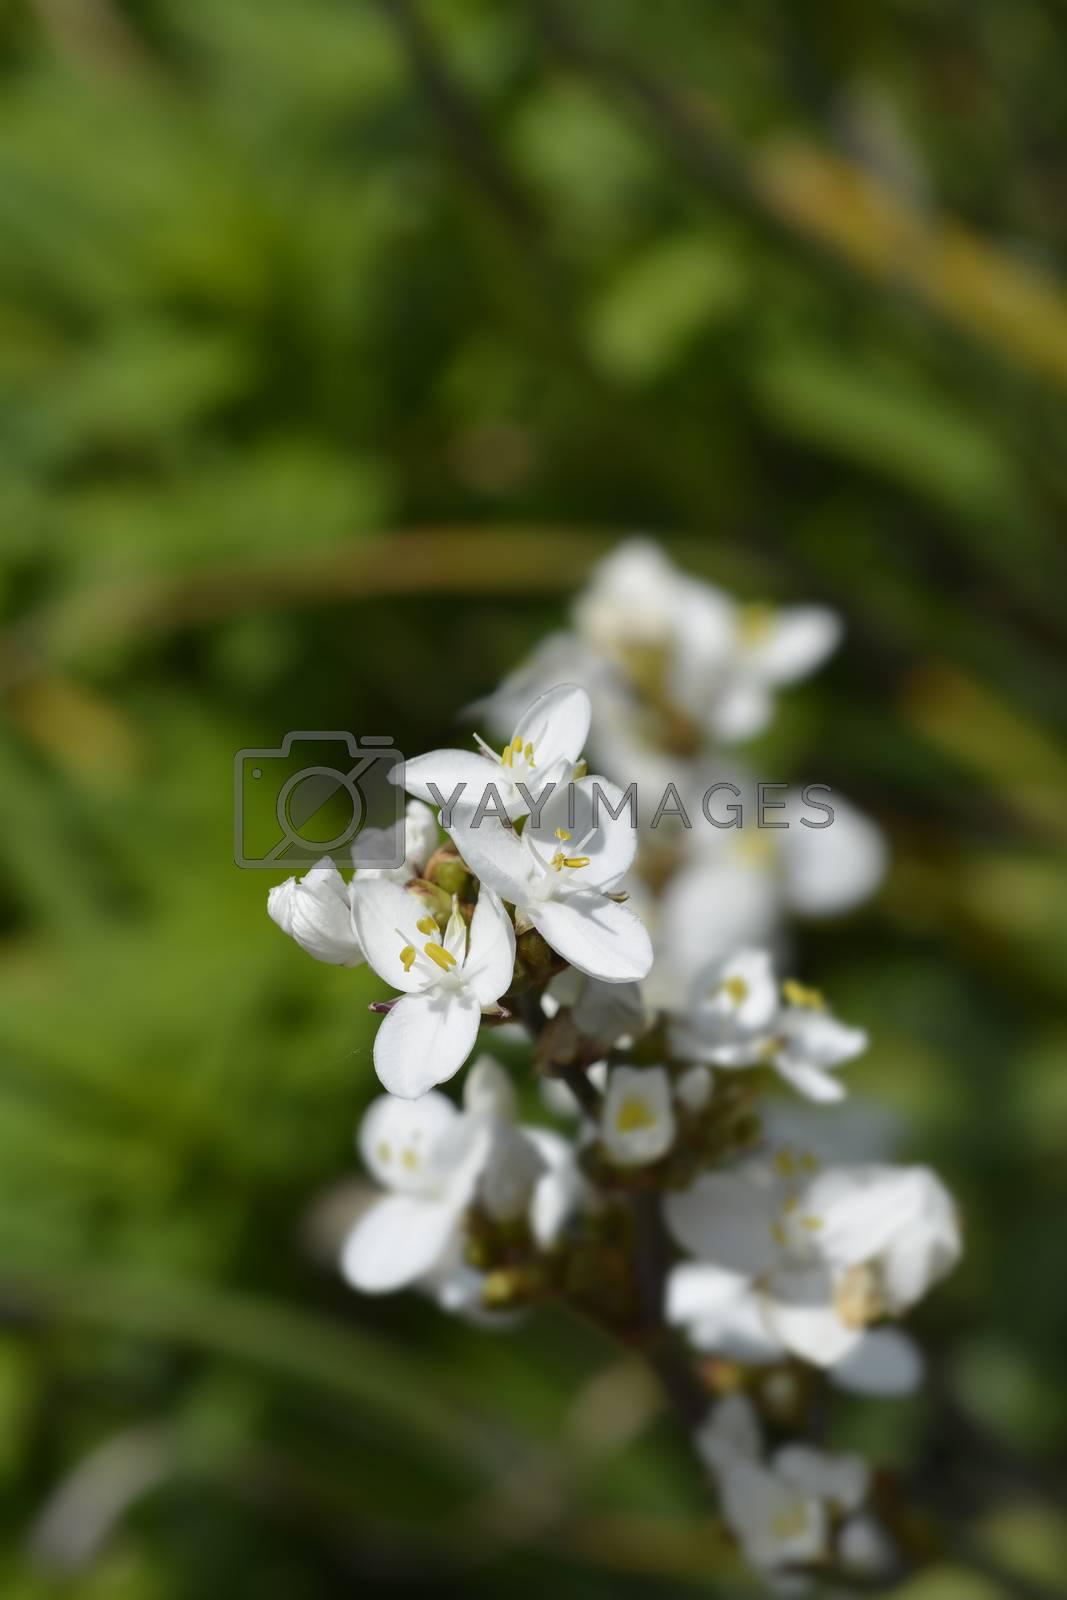 New Zealand satin flower - Latin name - Libertia grandiflora (Libertia chilensis)